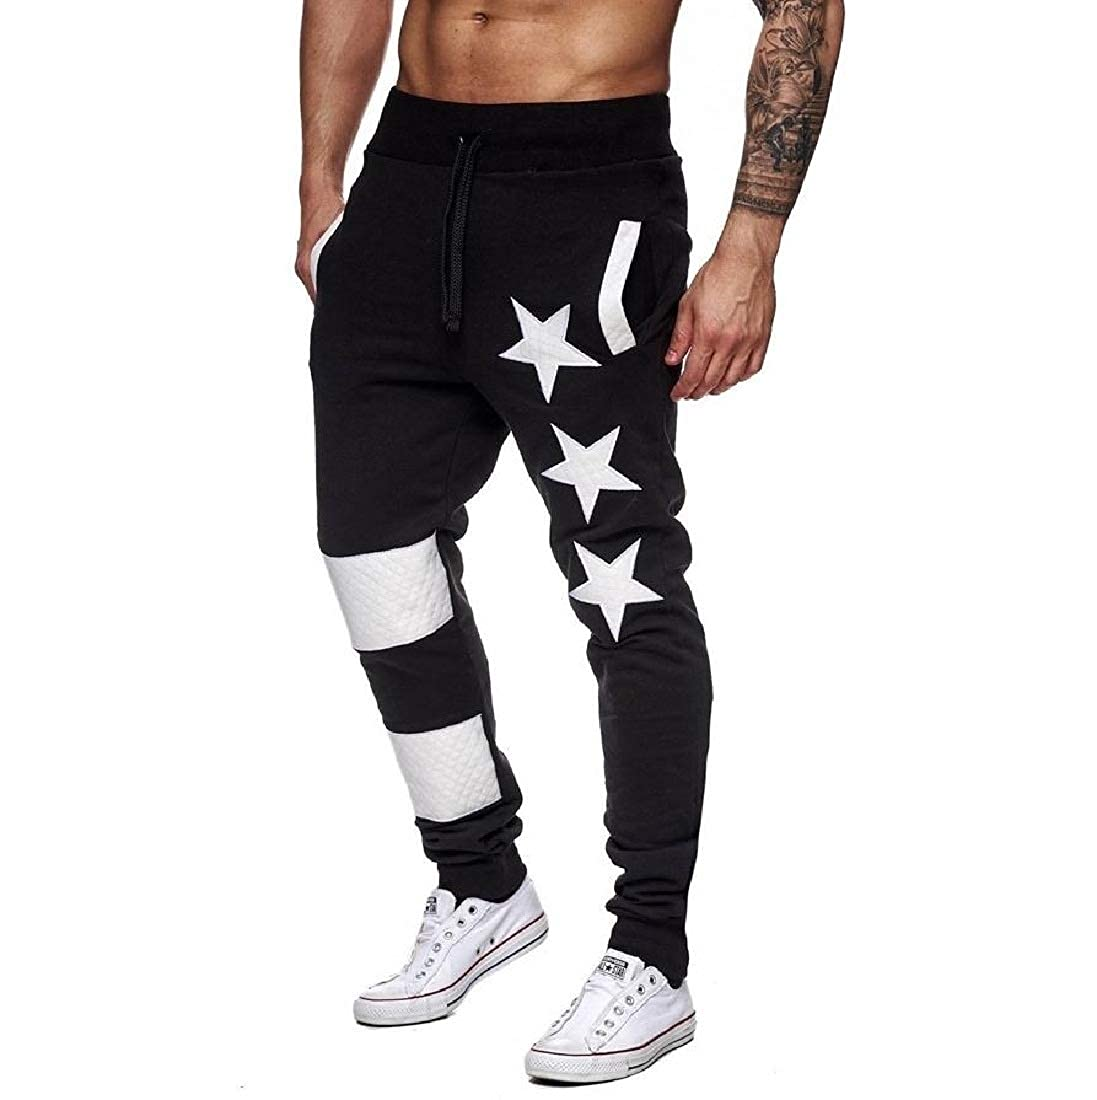 Mens Casual Patriotic Fitness Graceful Comfort Jogger Pants